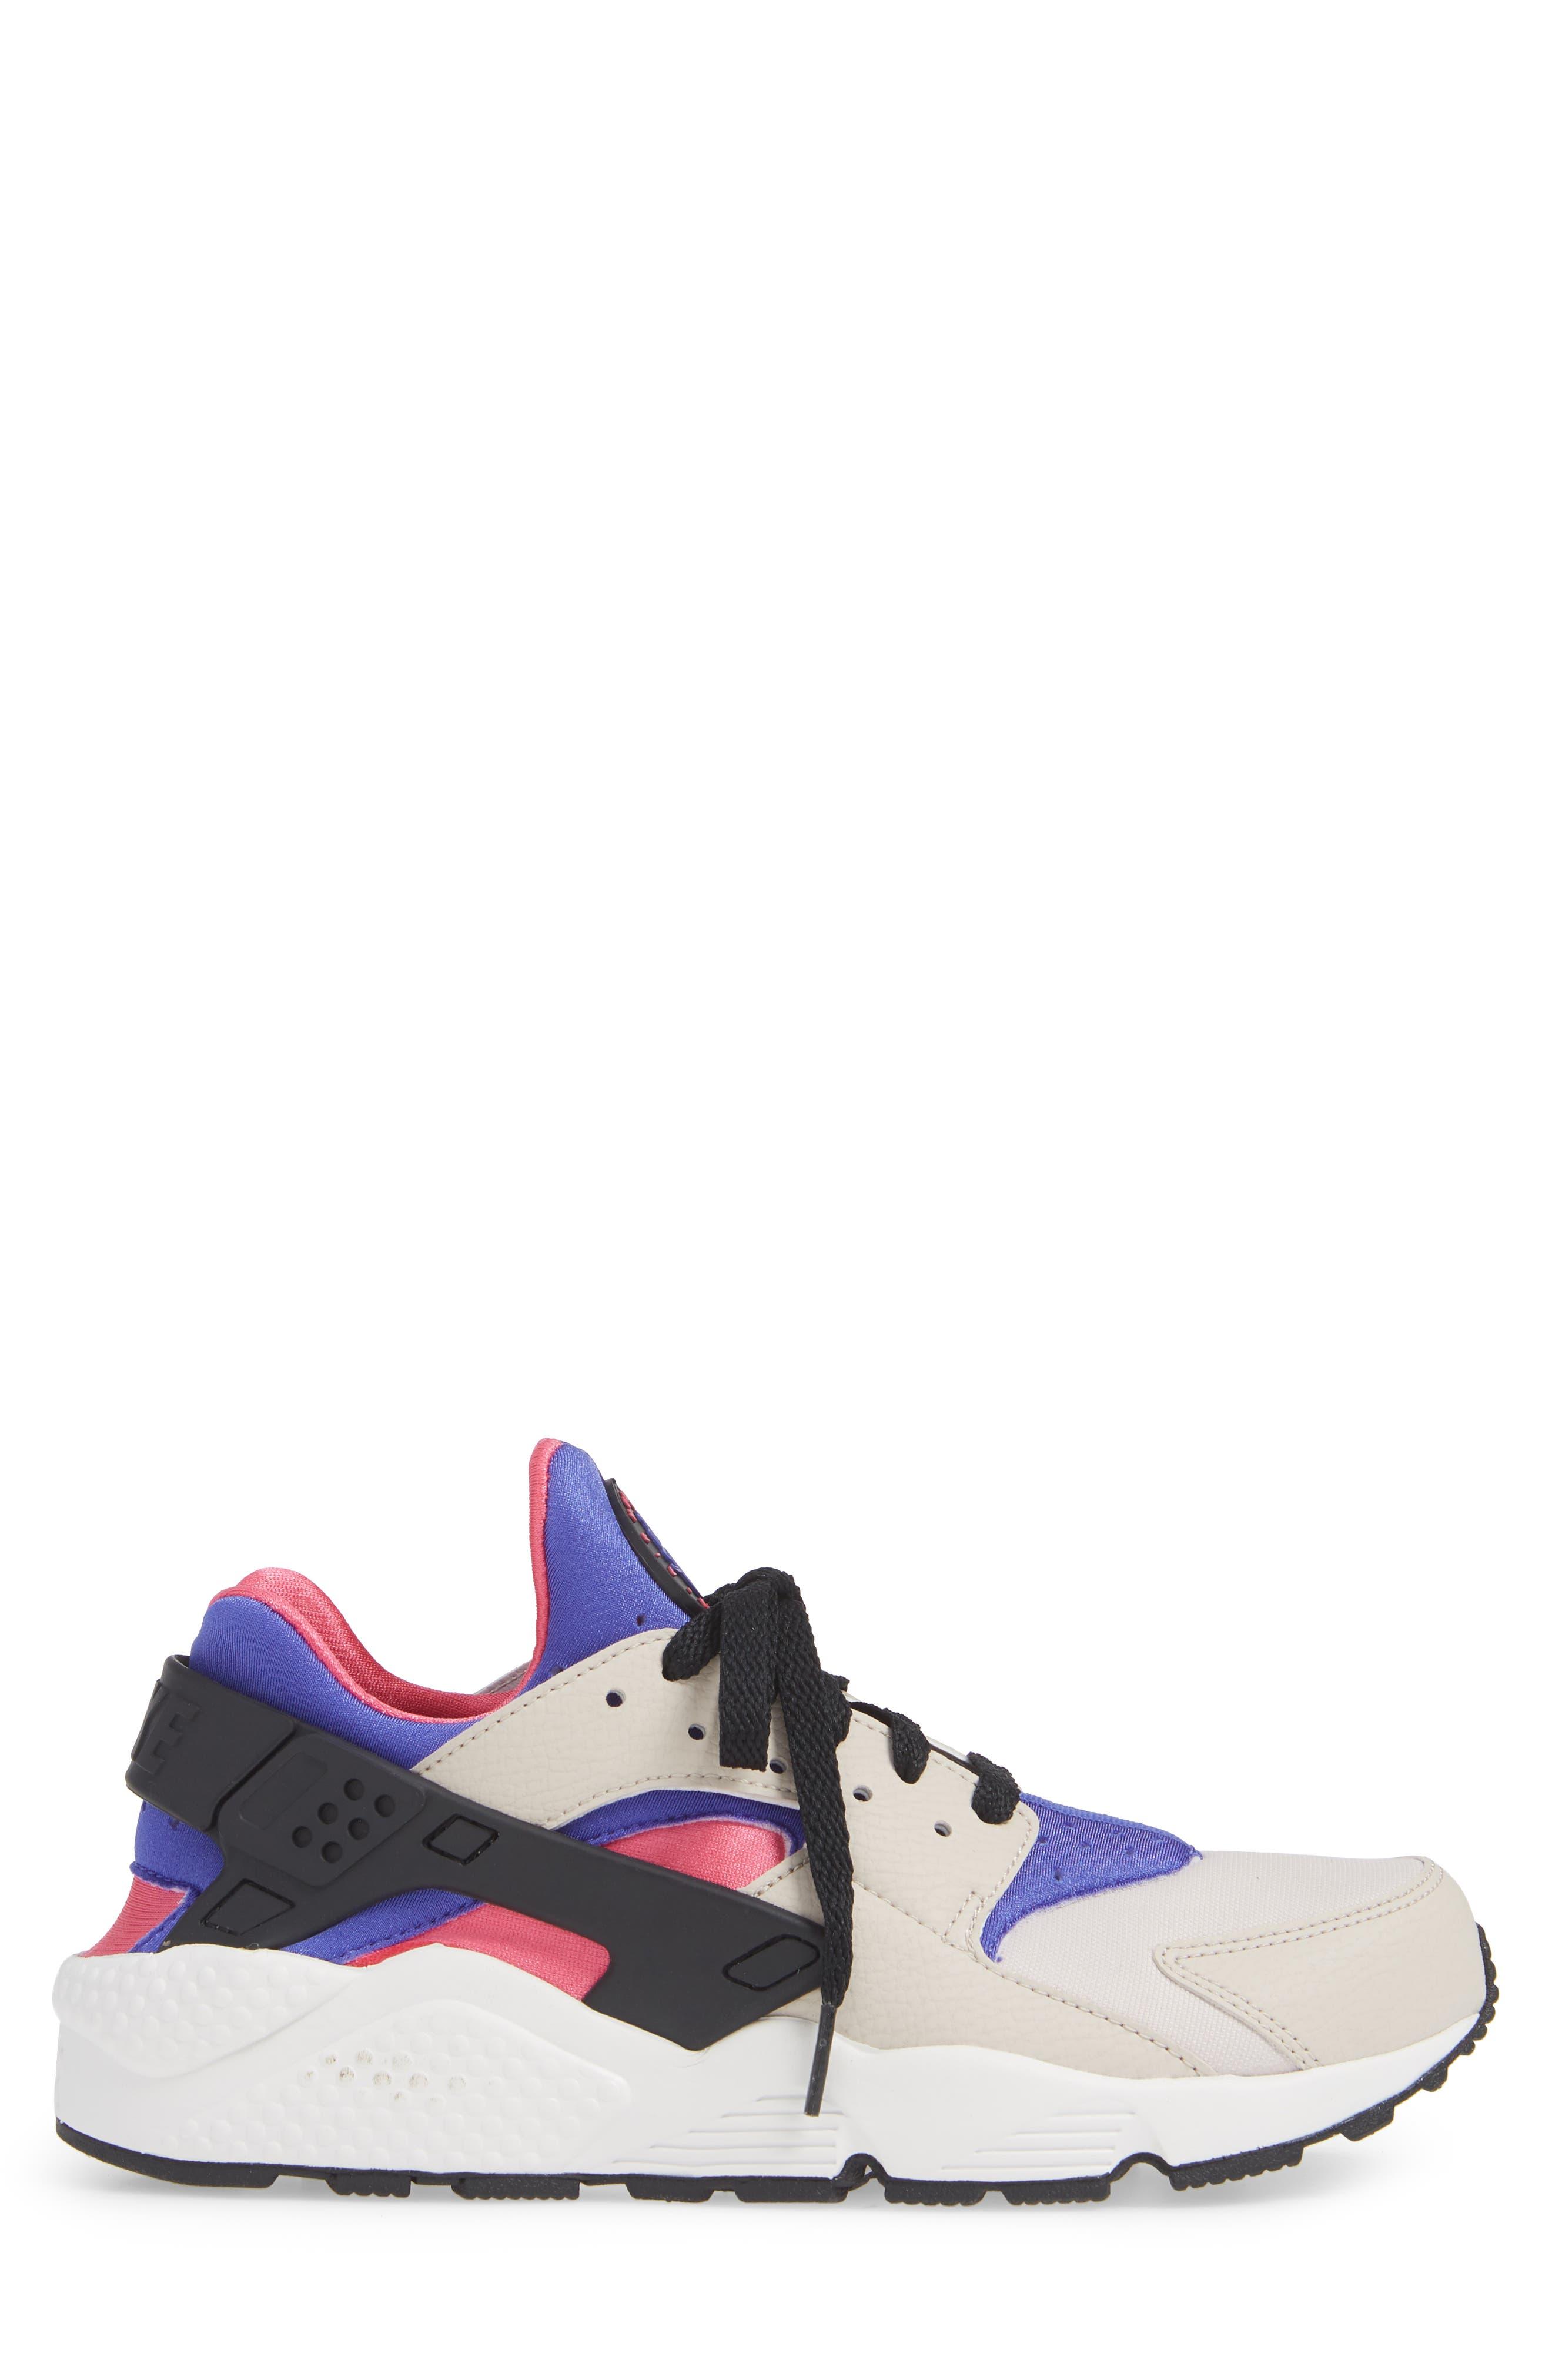 'Air Huarache' Sneaker,                             Alternate thumbnail 3, color,                             256